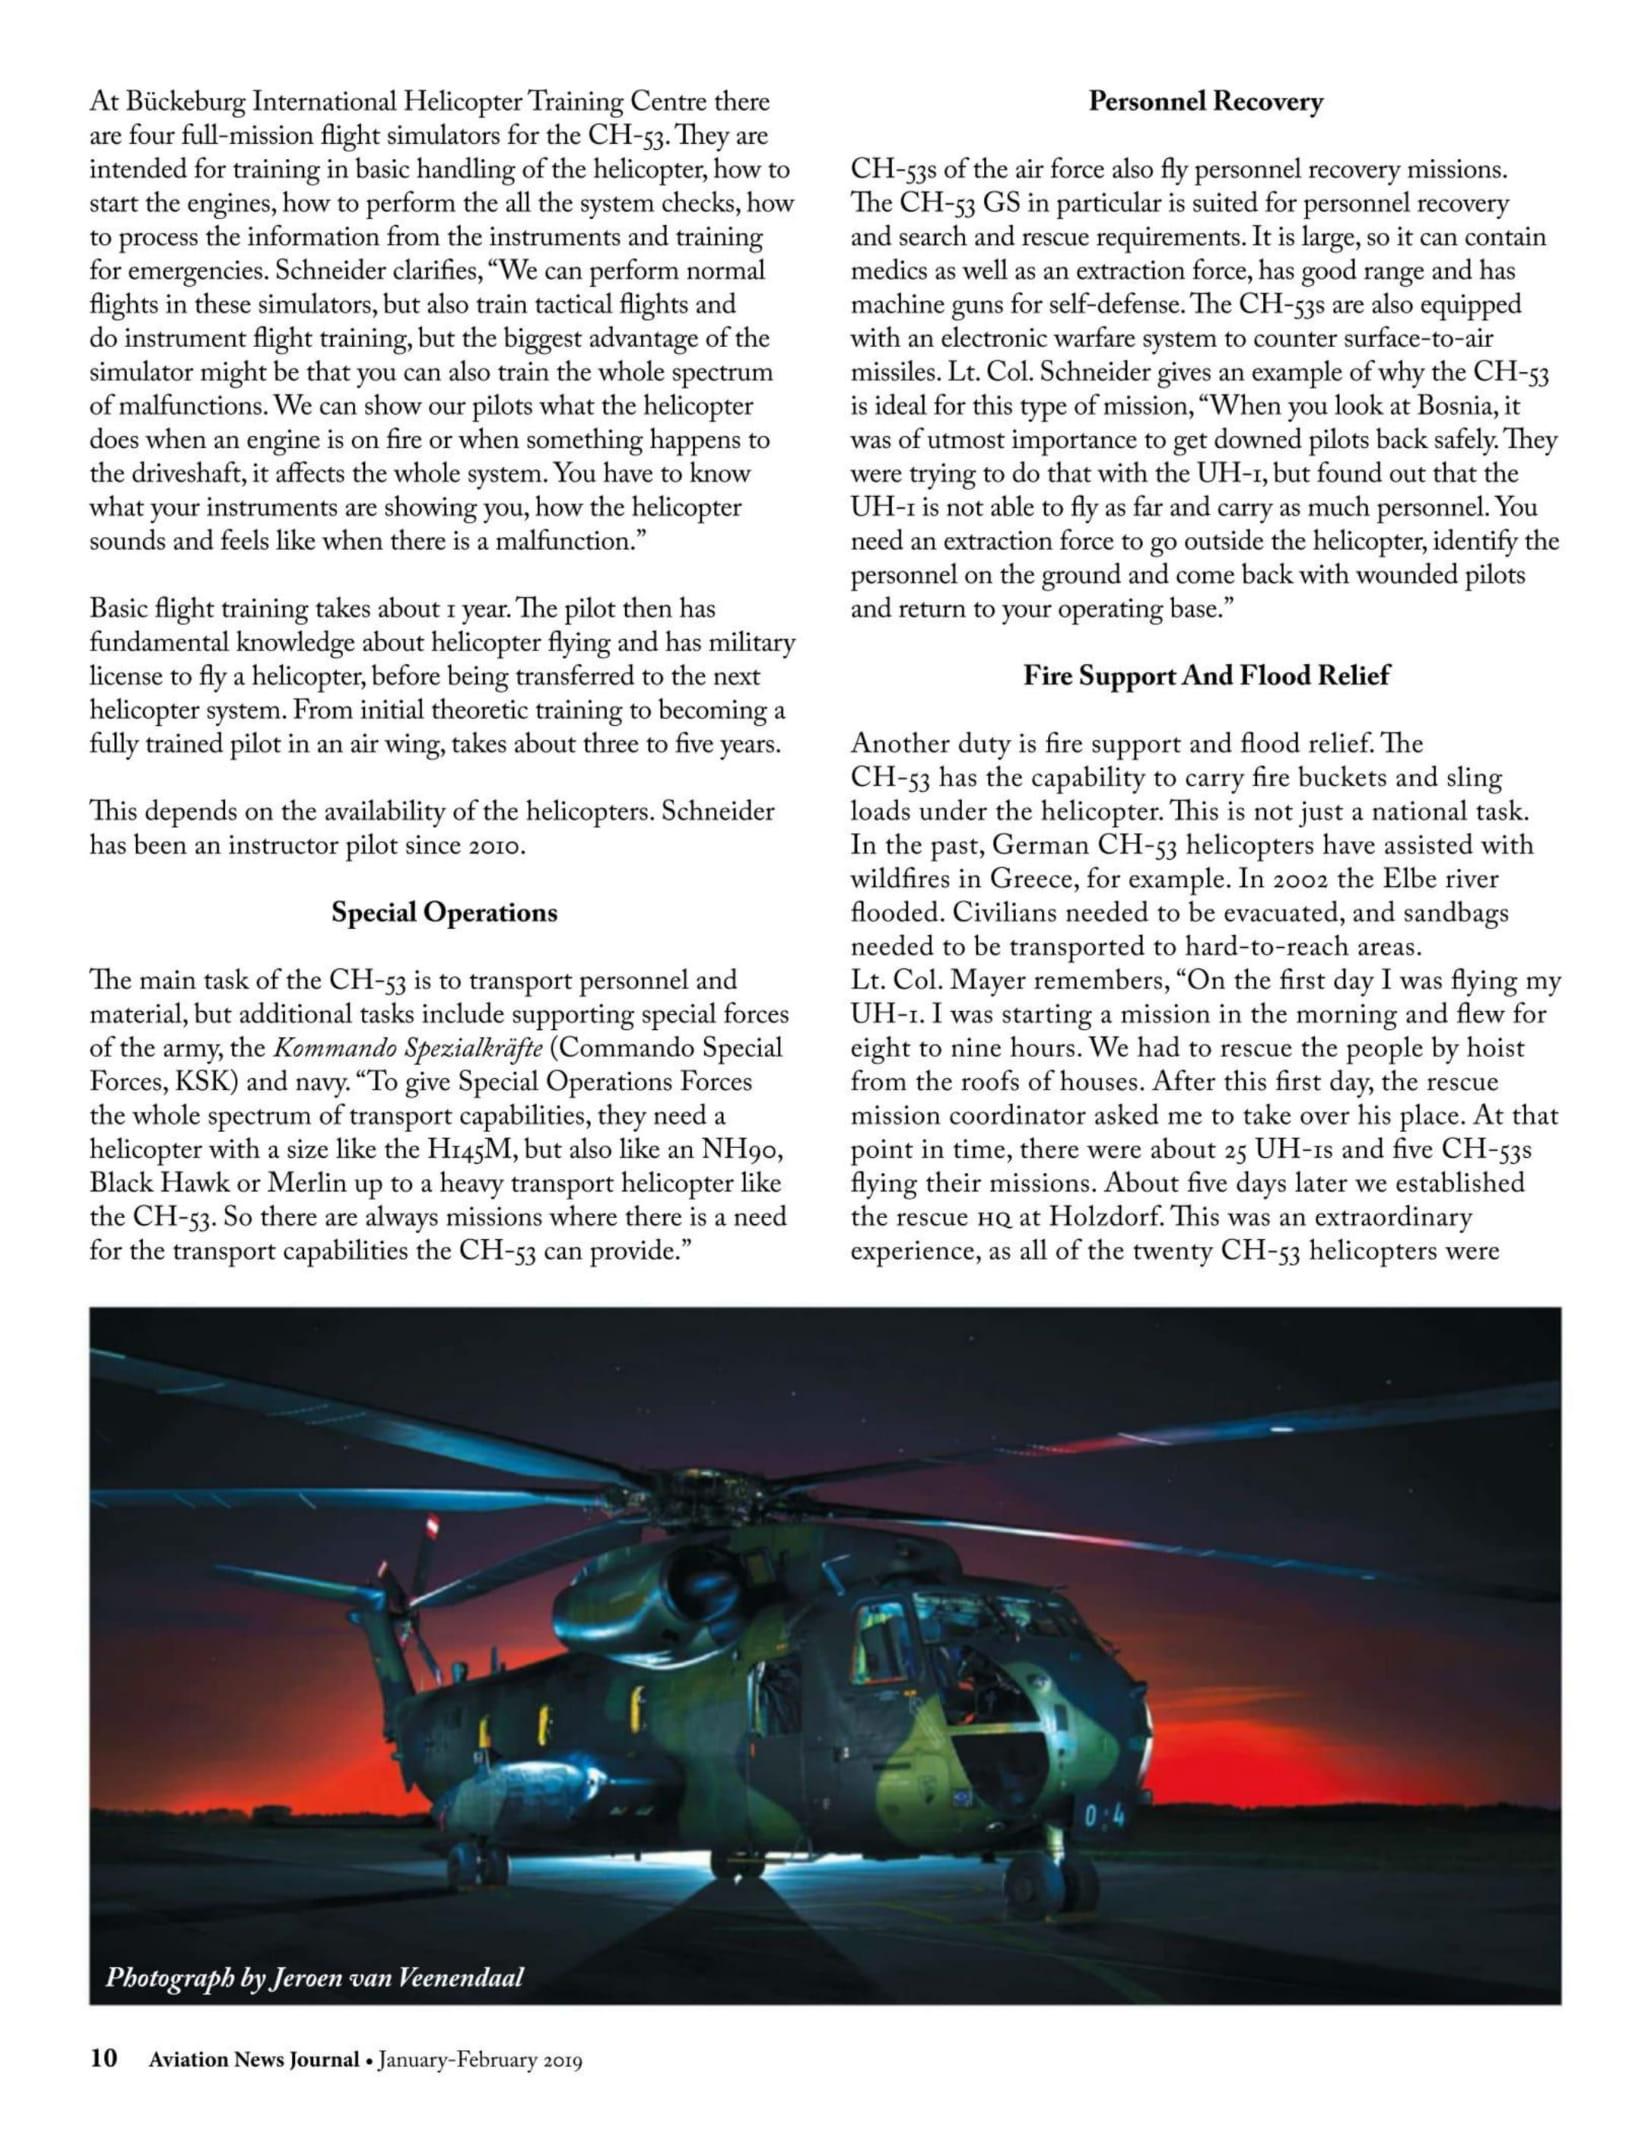 Aviation News Journal (Canada)_CH53s of the HSG 64, Laupheim AB-4